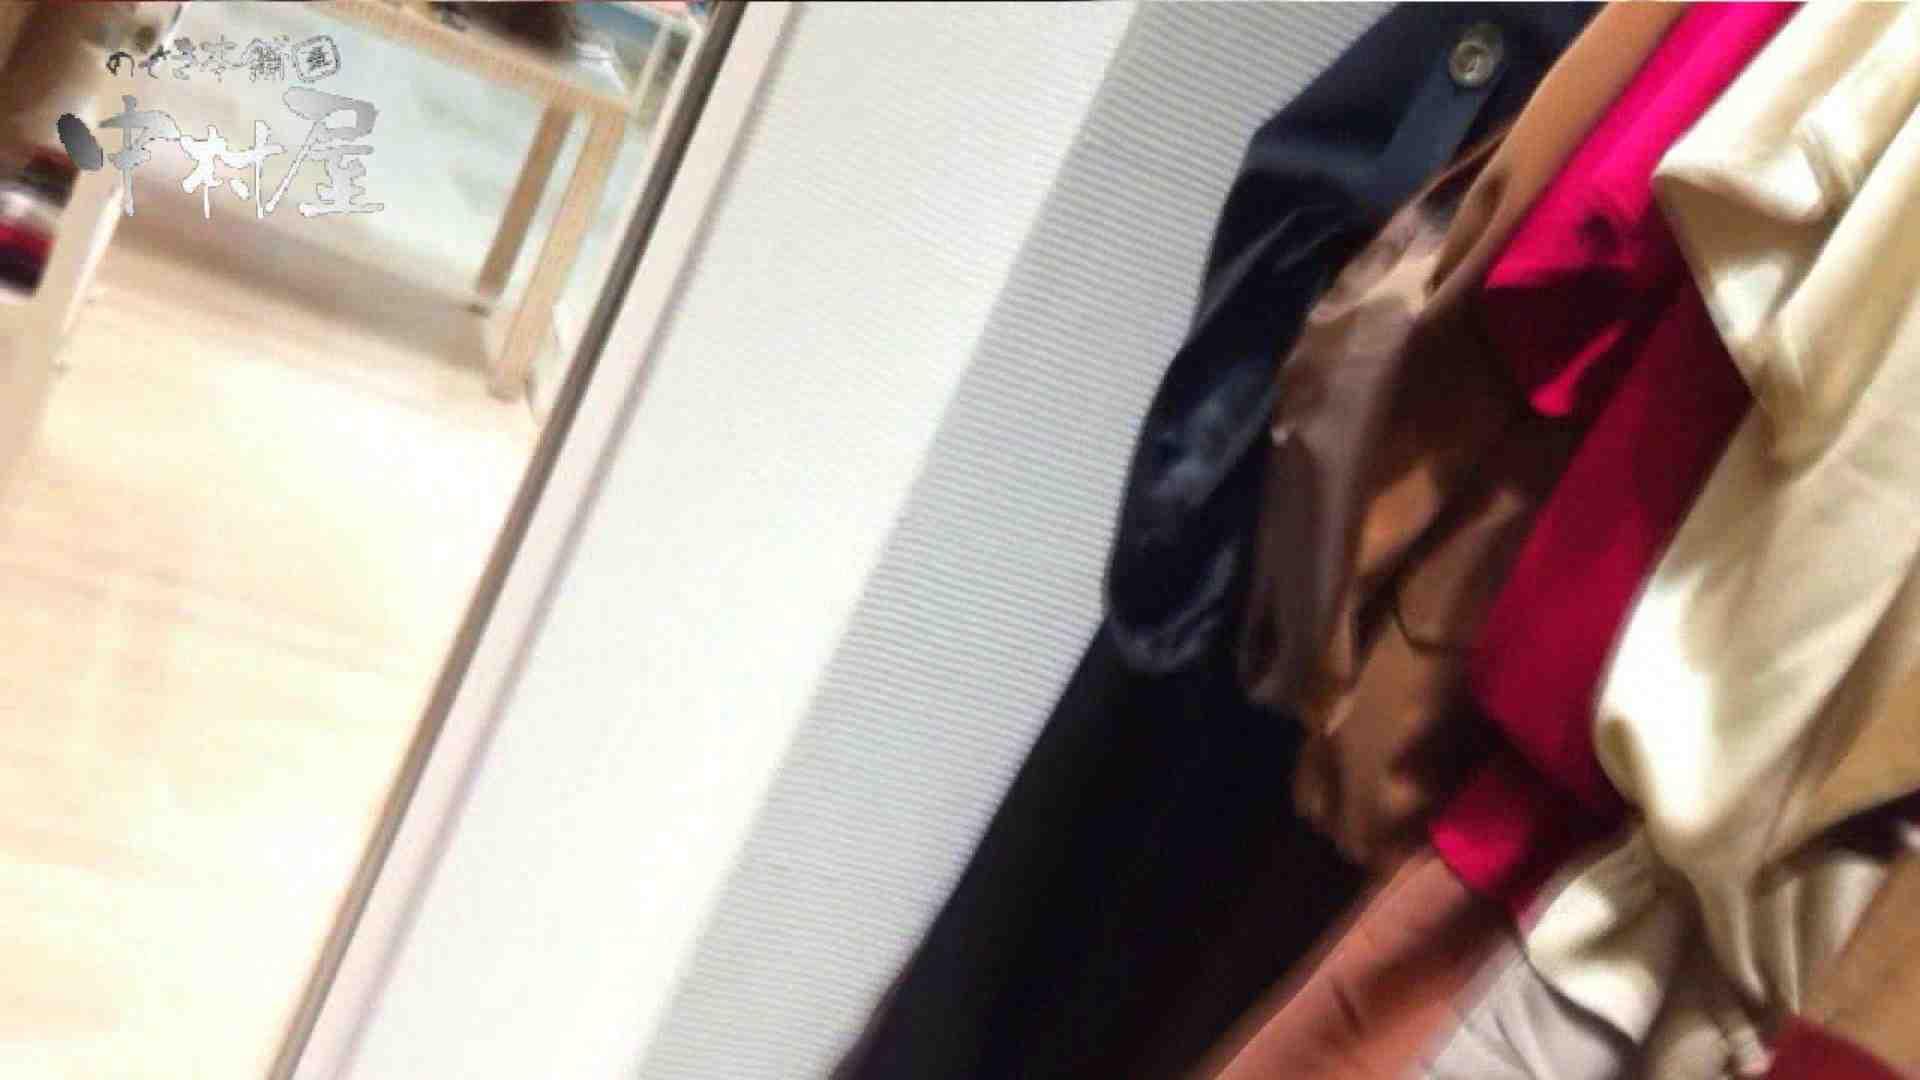 vol.52 美人アパレル胸チラ&パンチラ おとなしそうな店員の胸元にアタック! 美人  94Pix 71